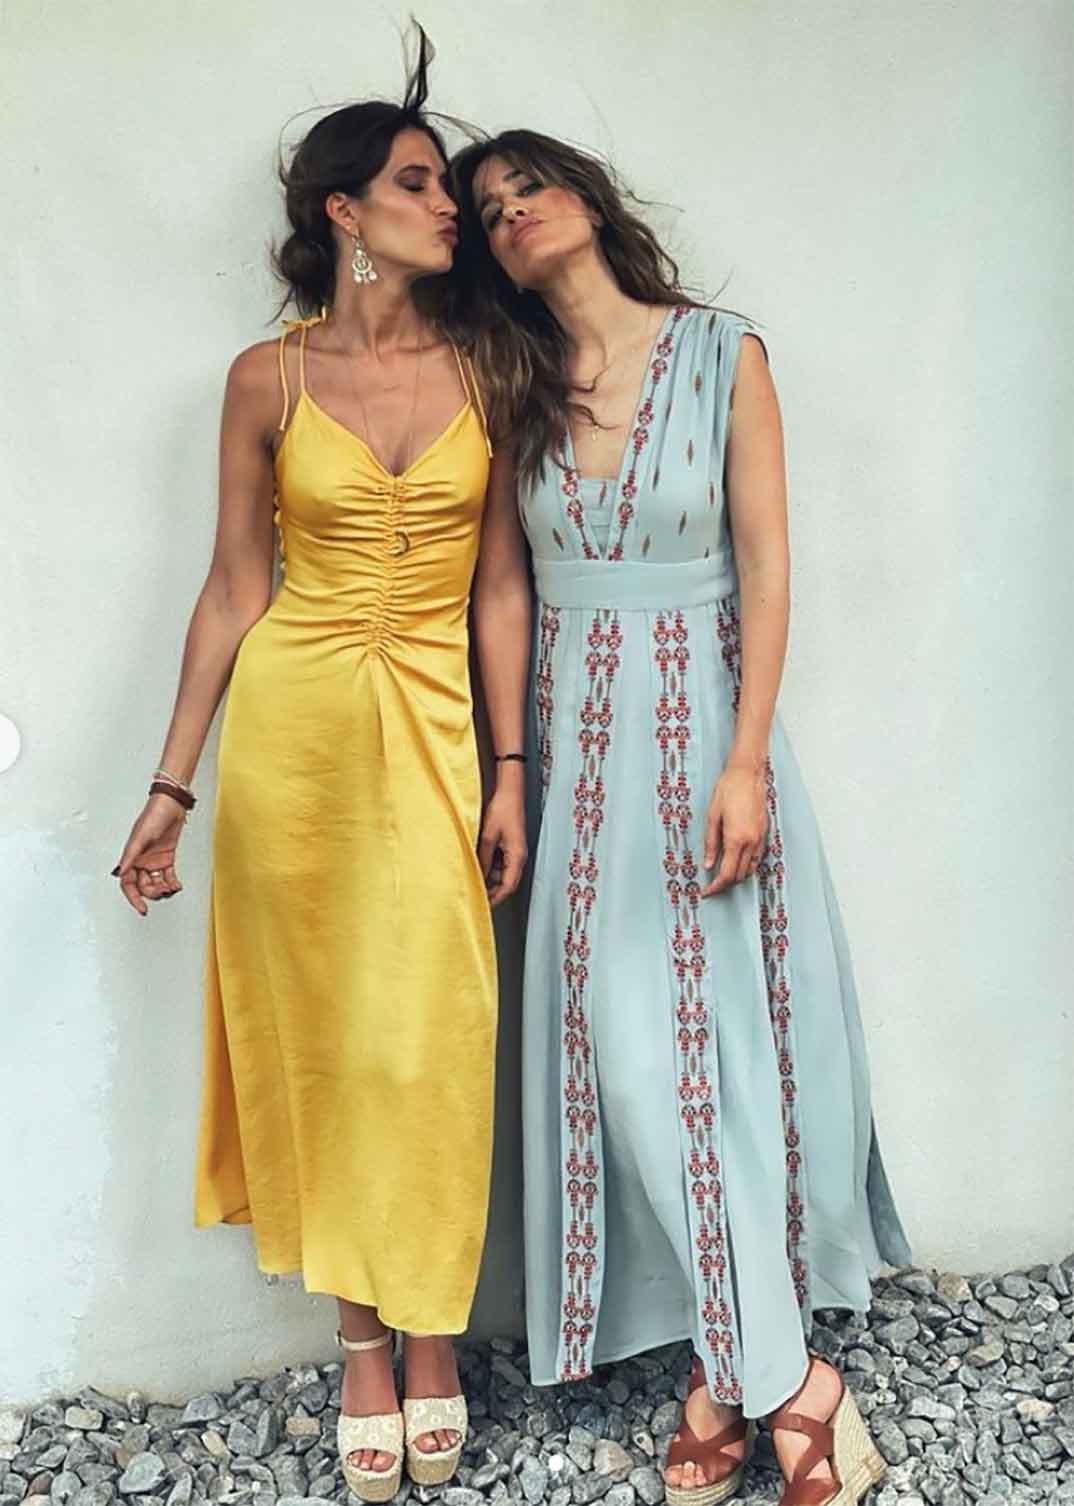 Sara Carbonero e Isabel Jiménez © Instagram